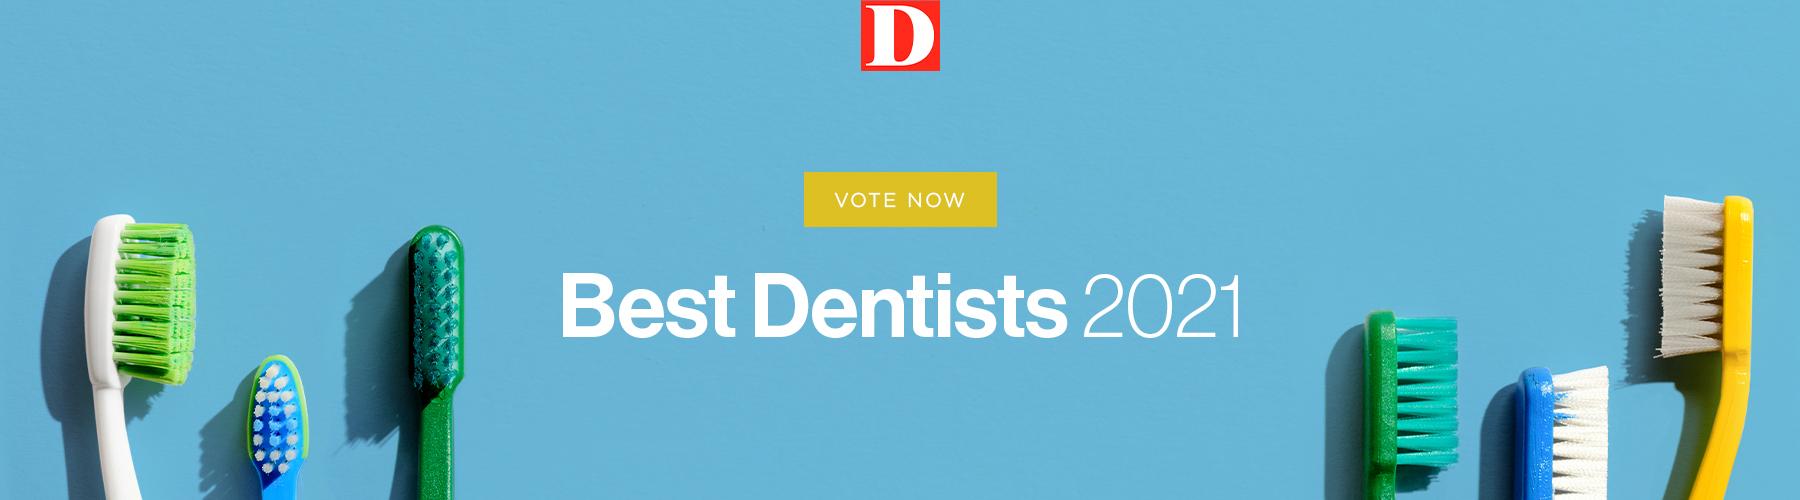 Best Dentists 2021 Form Header